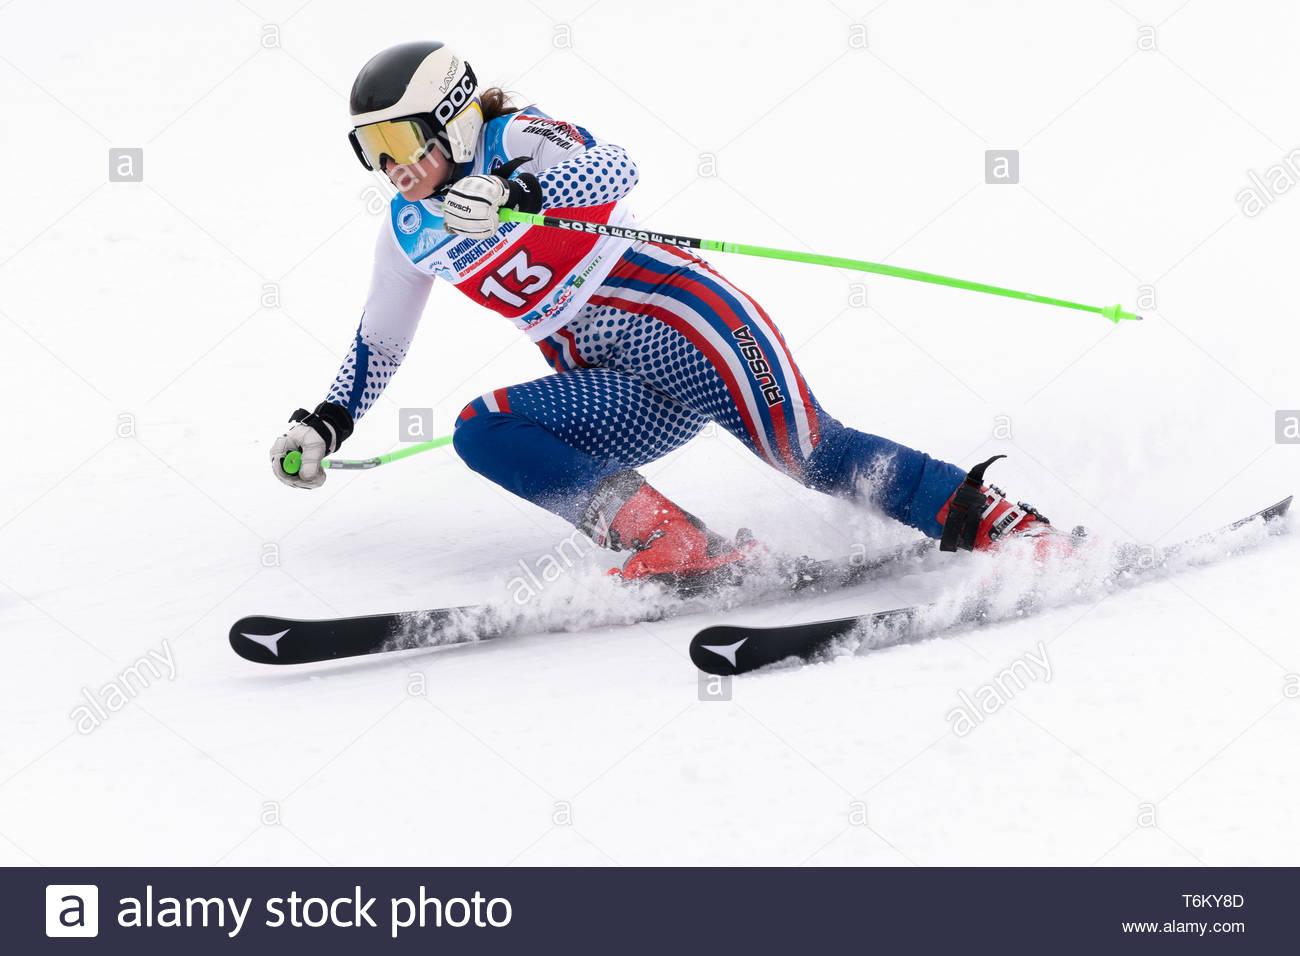 KAMCHATKA, RUSSIA - APRIL 2, 2019: Mountain skier Khartsyzova Alena (St. Petersburg) skiing down mount slope. Russian Women's Alpine Skiing Cup, Inter - Stock Image